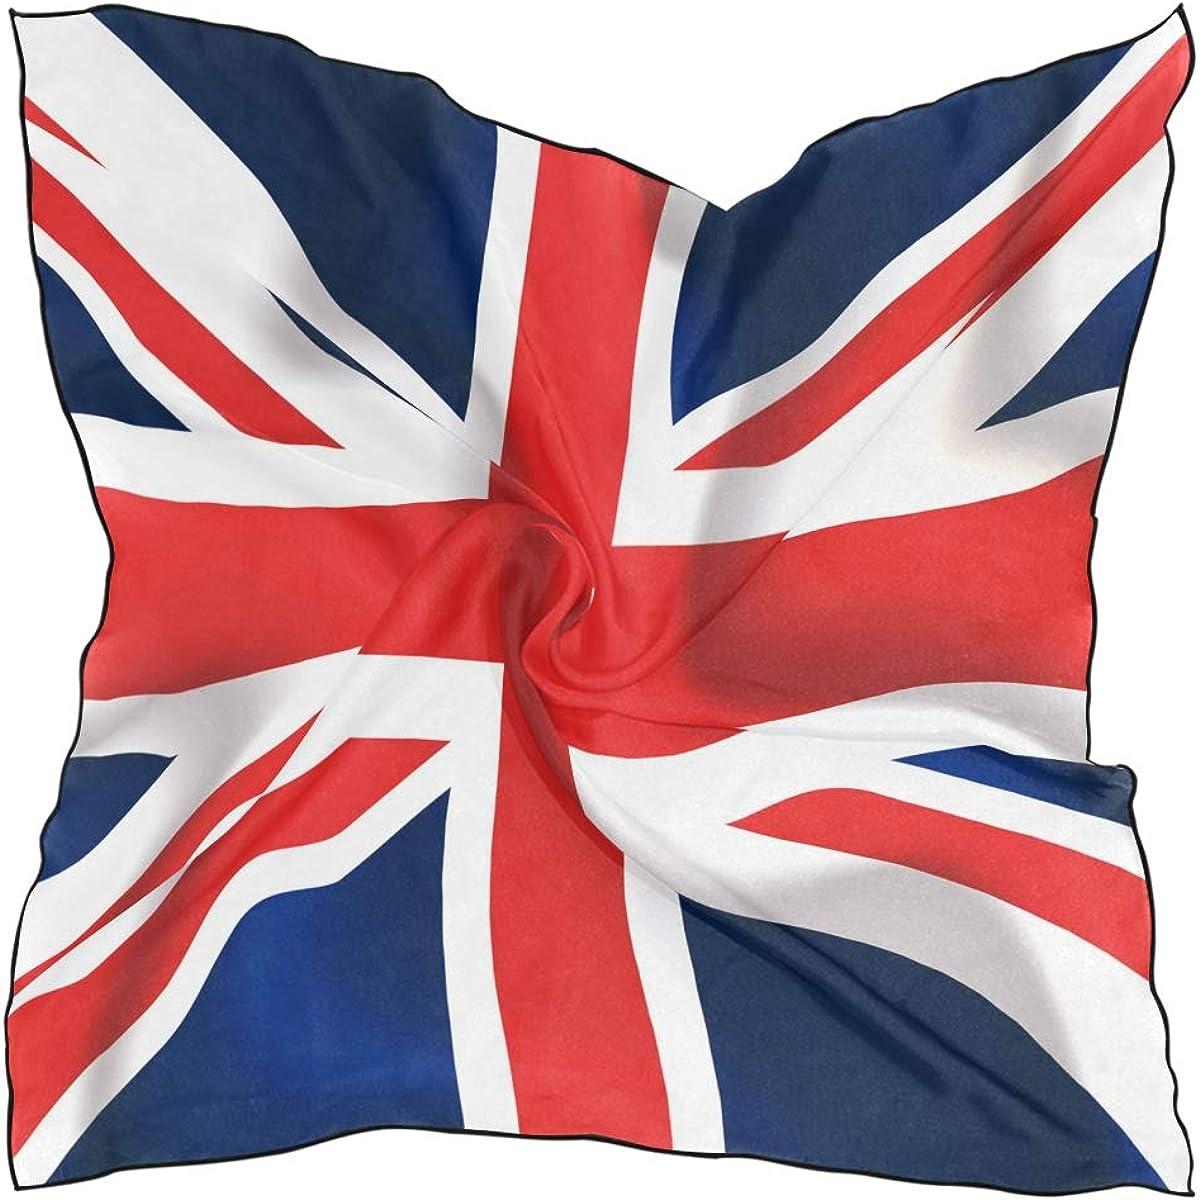 XLING Fashion Square Scarf British Union Jack Flag Pattern Lightweight Sunscreen Scarves Muffler Hair Wrap Headscarf Neckerchief for Women Men